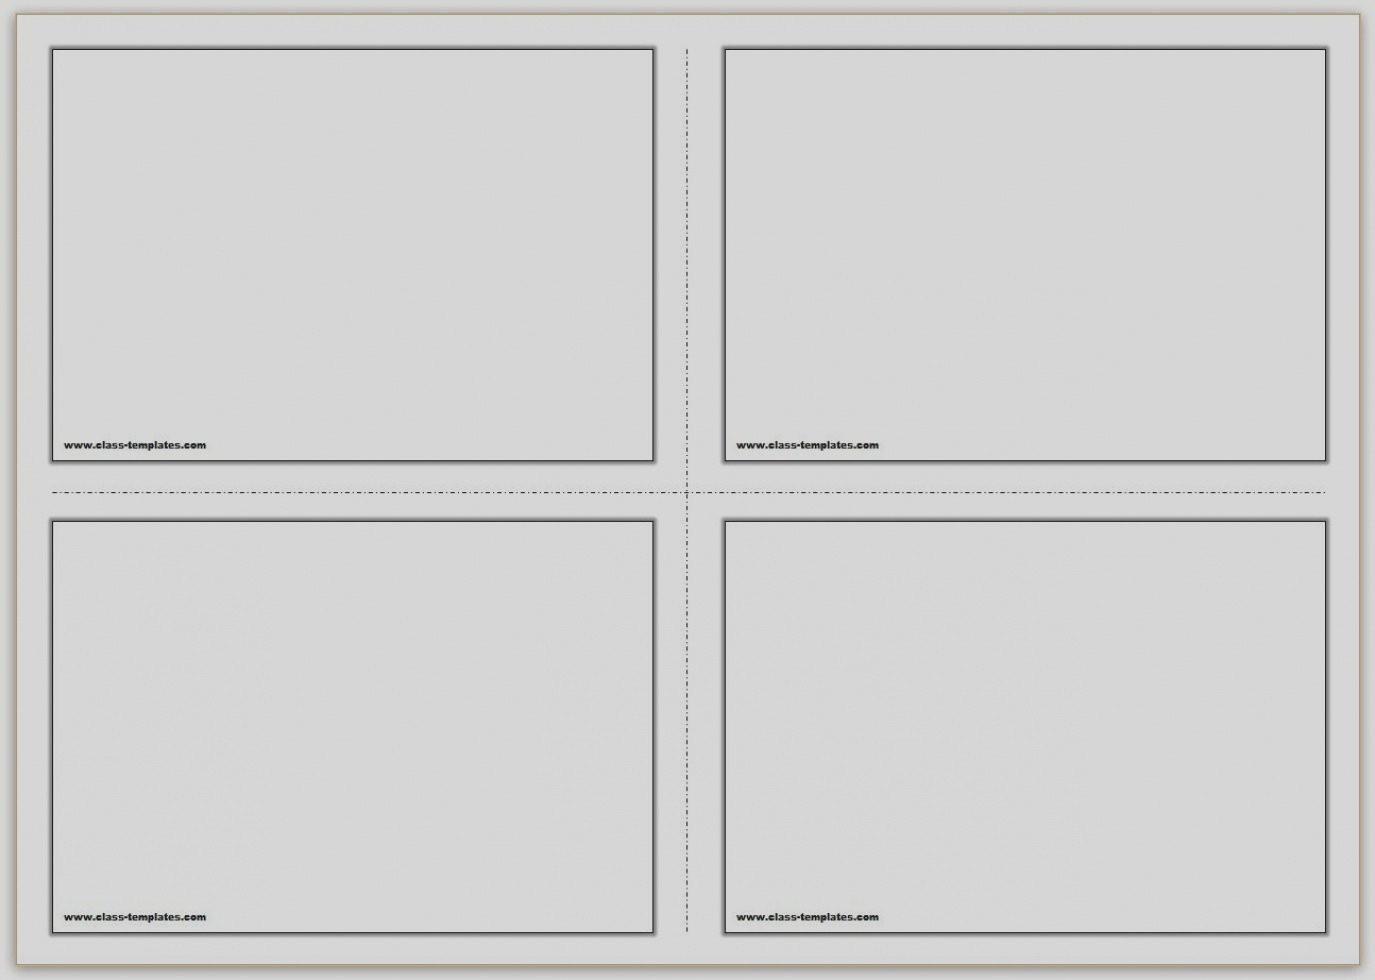 Free Rolodex Template Microsoft Word Fresh Terrific S 3x5 Card Template Word Twilightblog